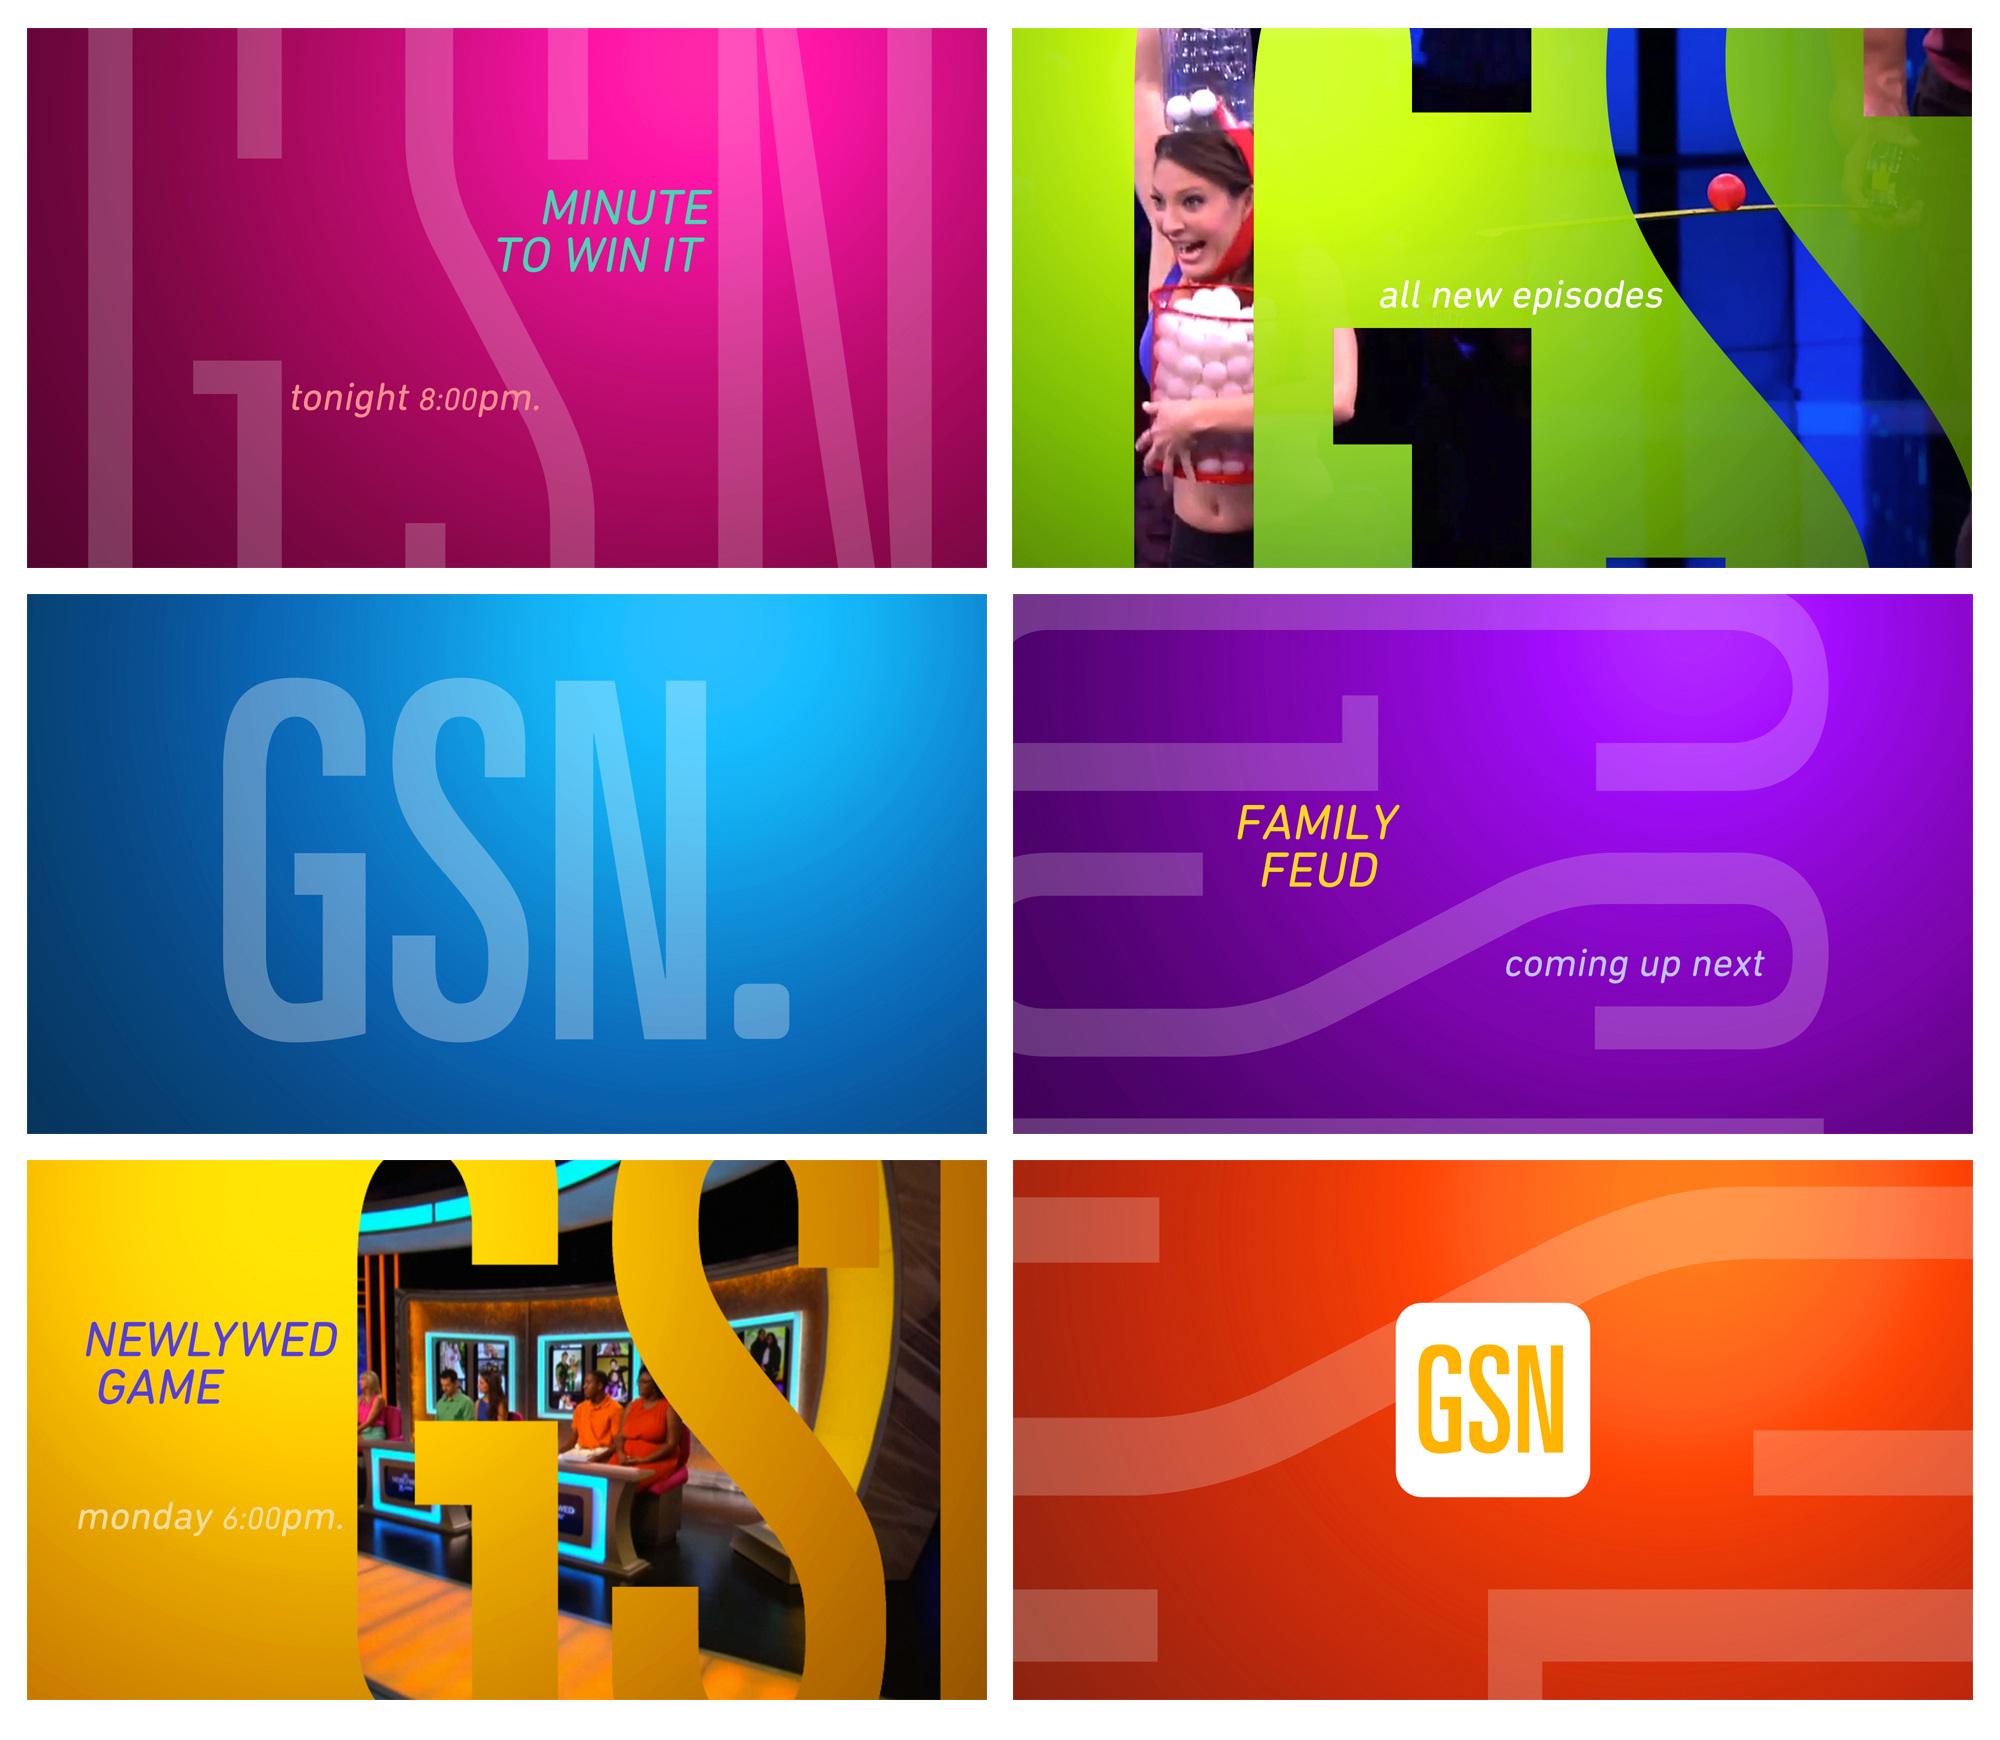 GSN Rebranding - EJ